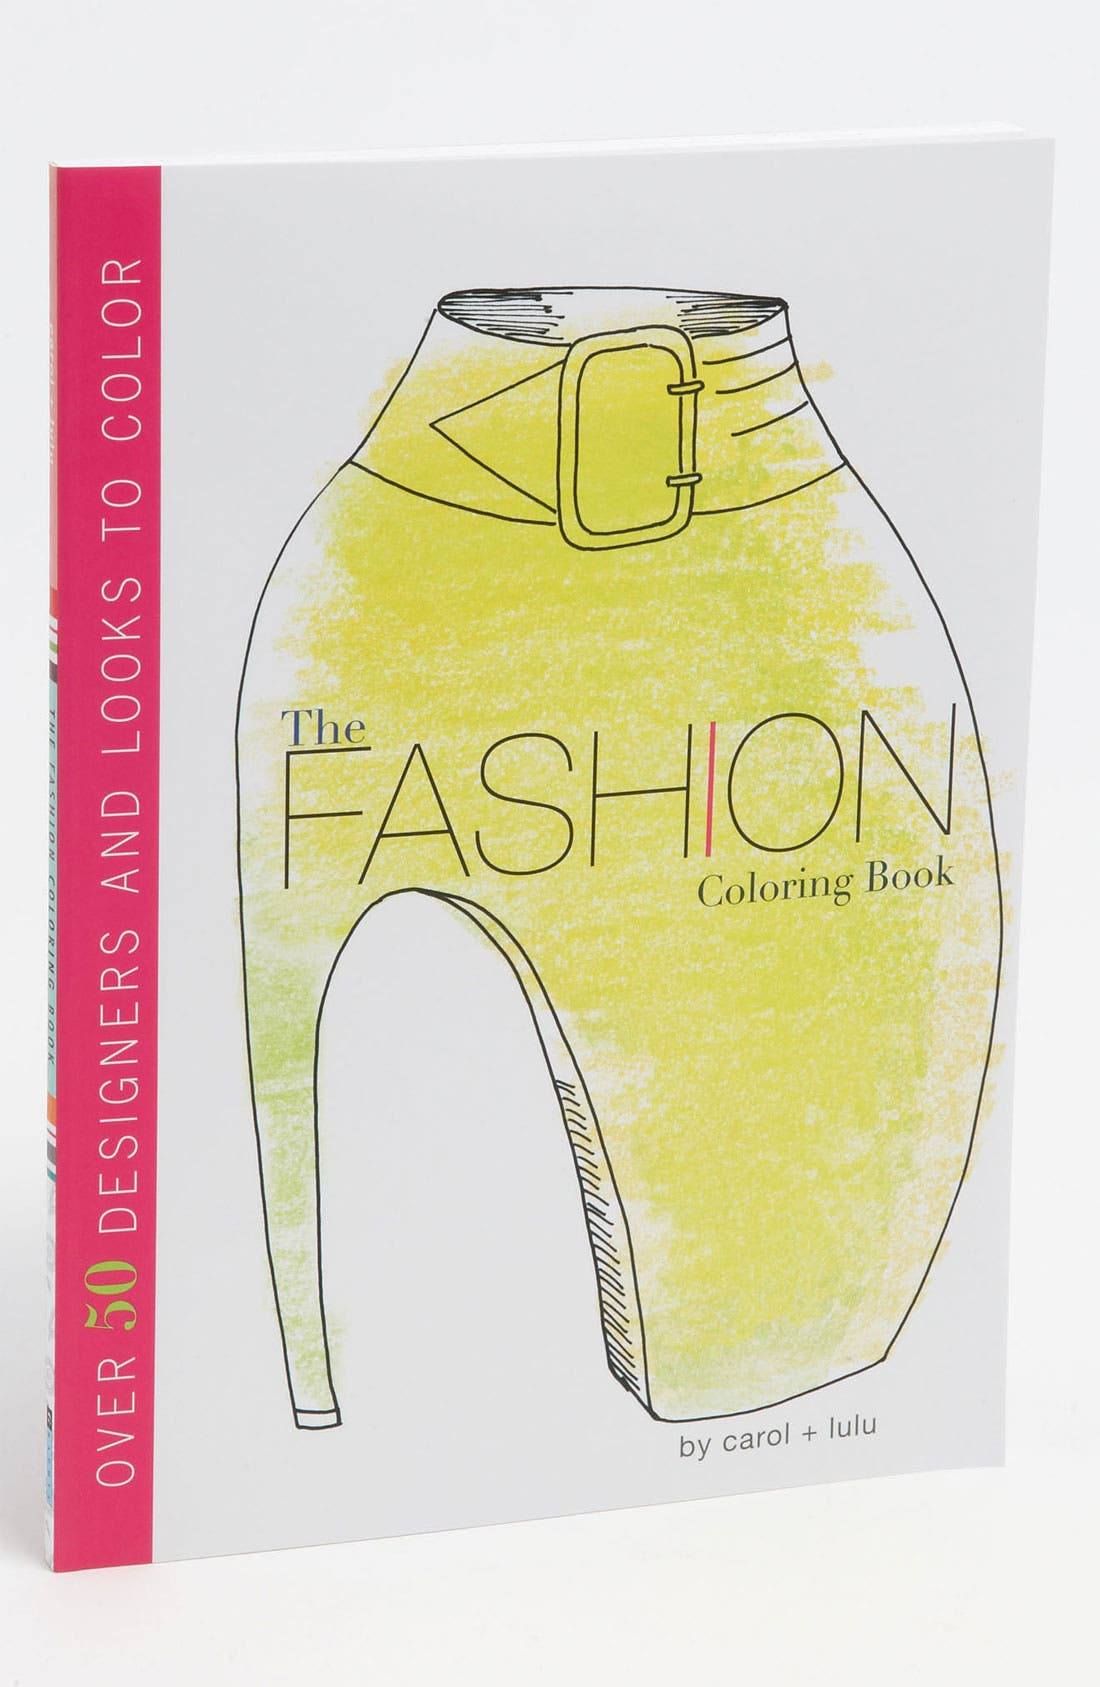 Alternate Image 1 Selected - Carol + Lulu 'The Fashion Coloring Book' (Girls)